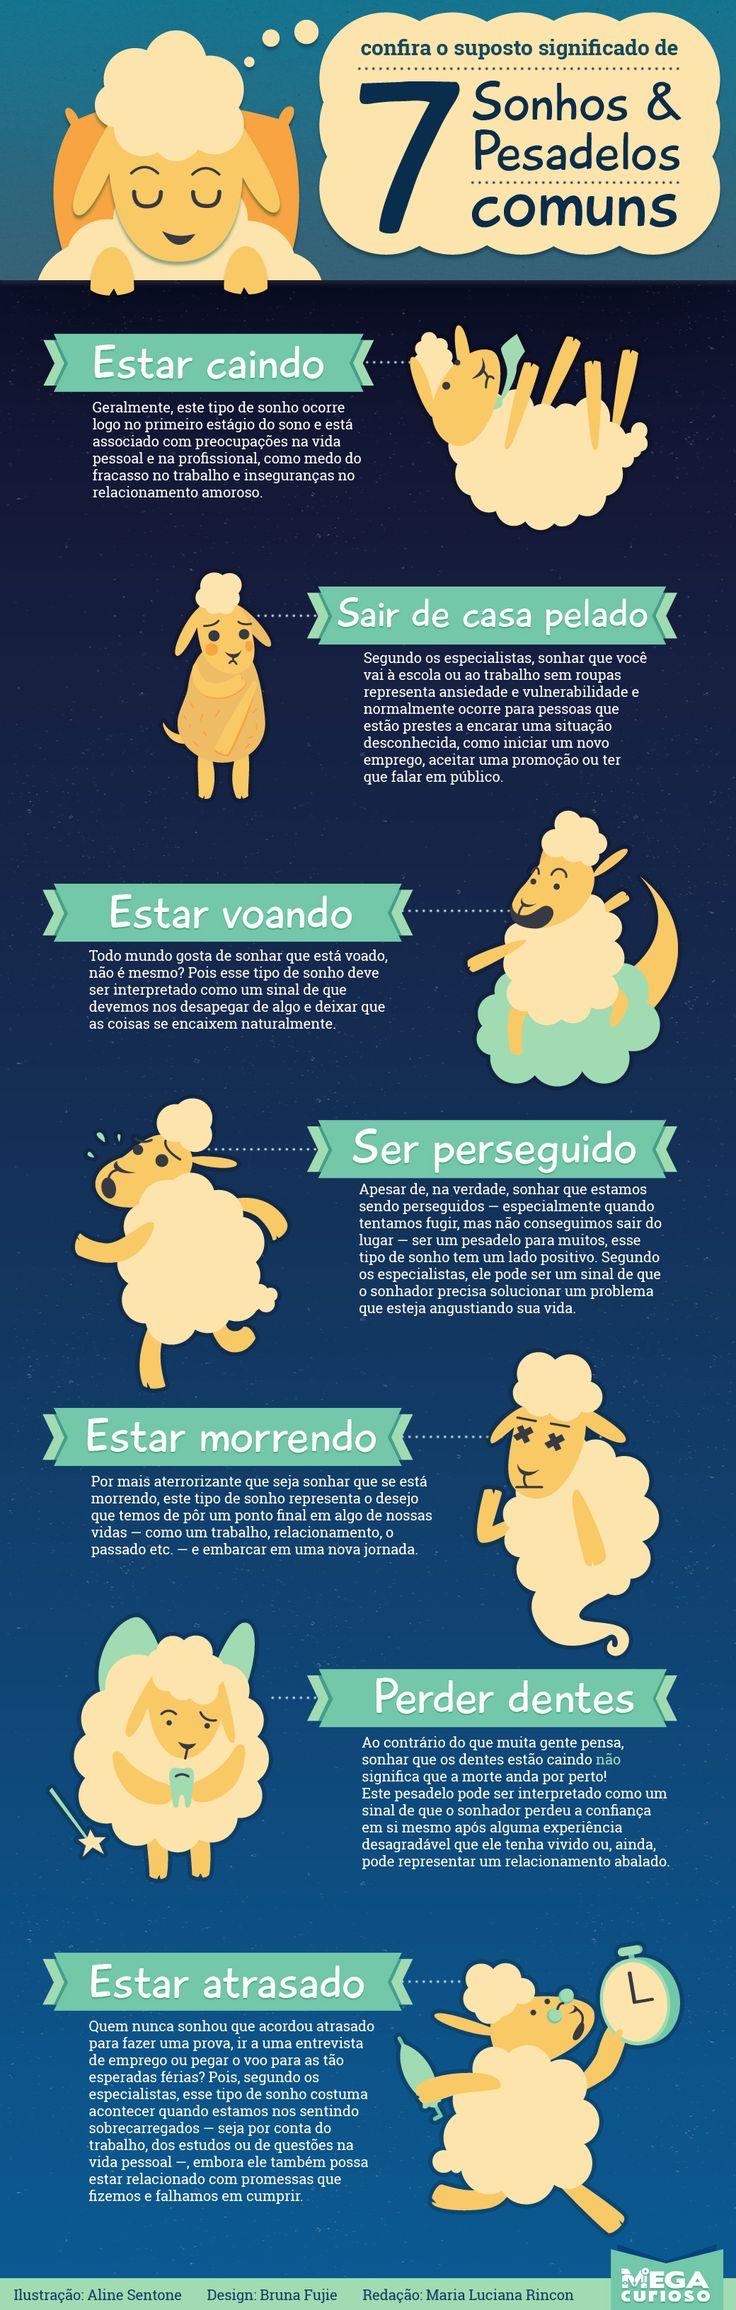 Confira o suposto significado de 7 sonhos e pesadelos comuns